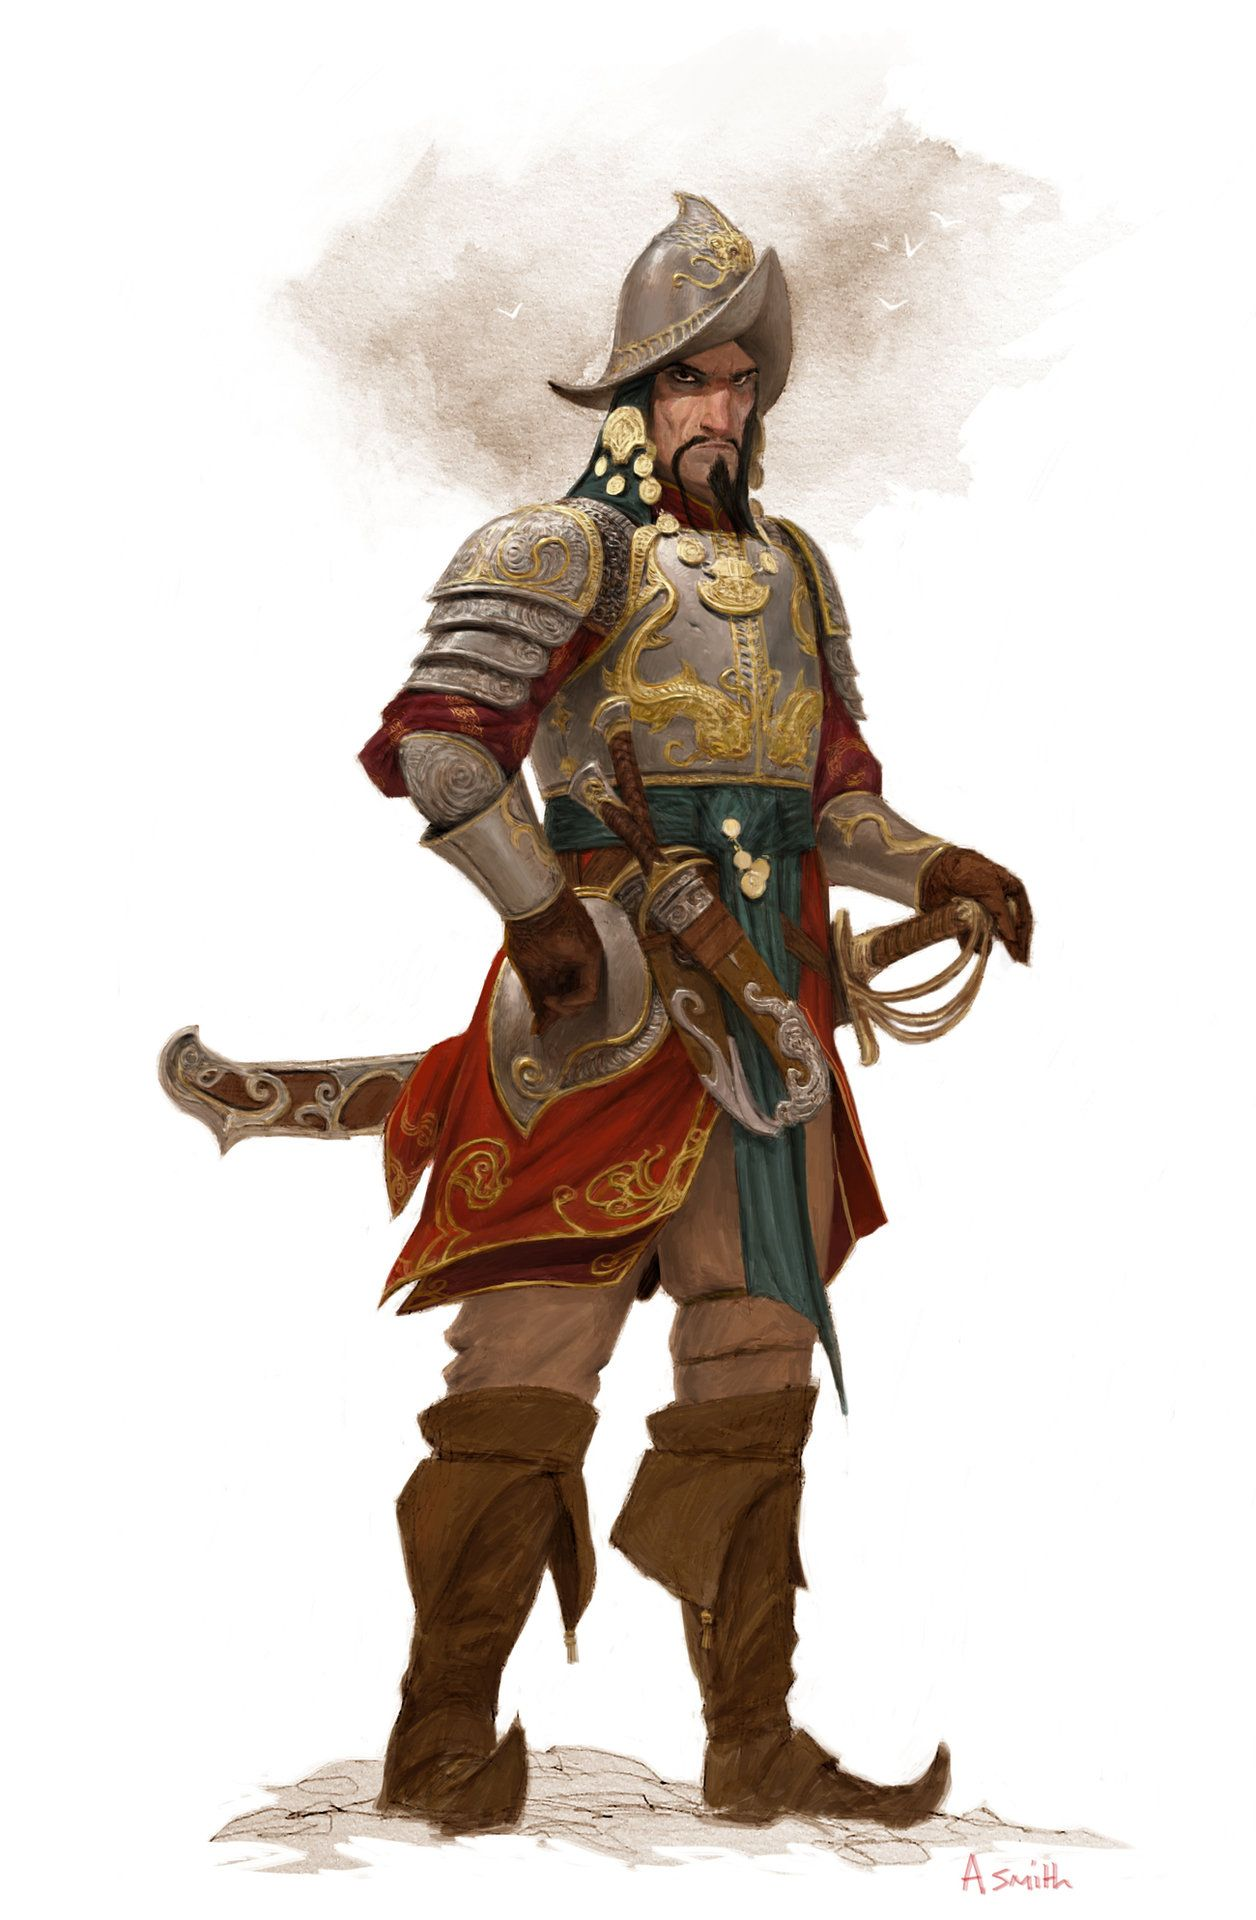 ArtStation - Zaparavo-character for 'Conan' board game, adrian smith